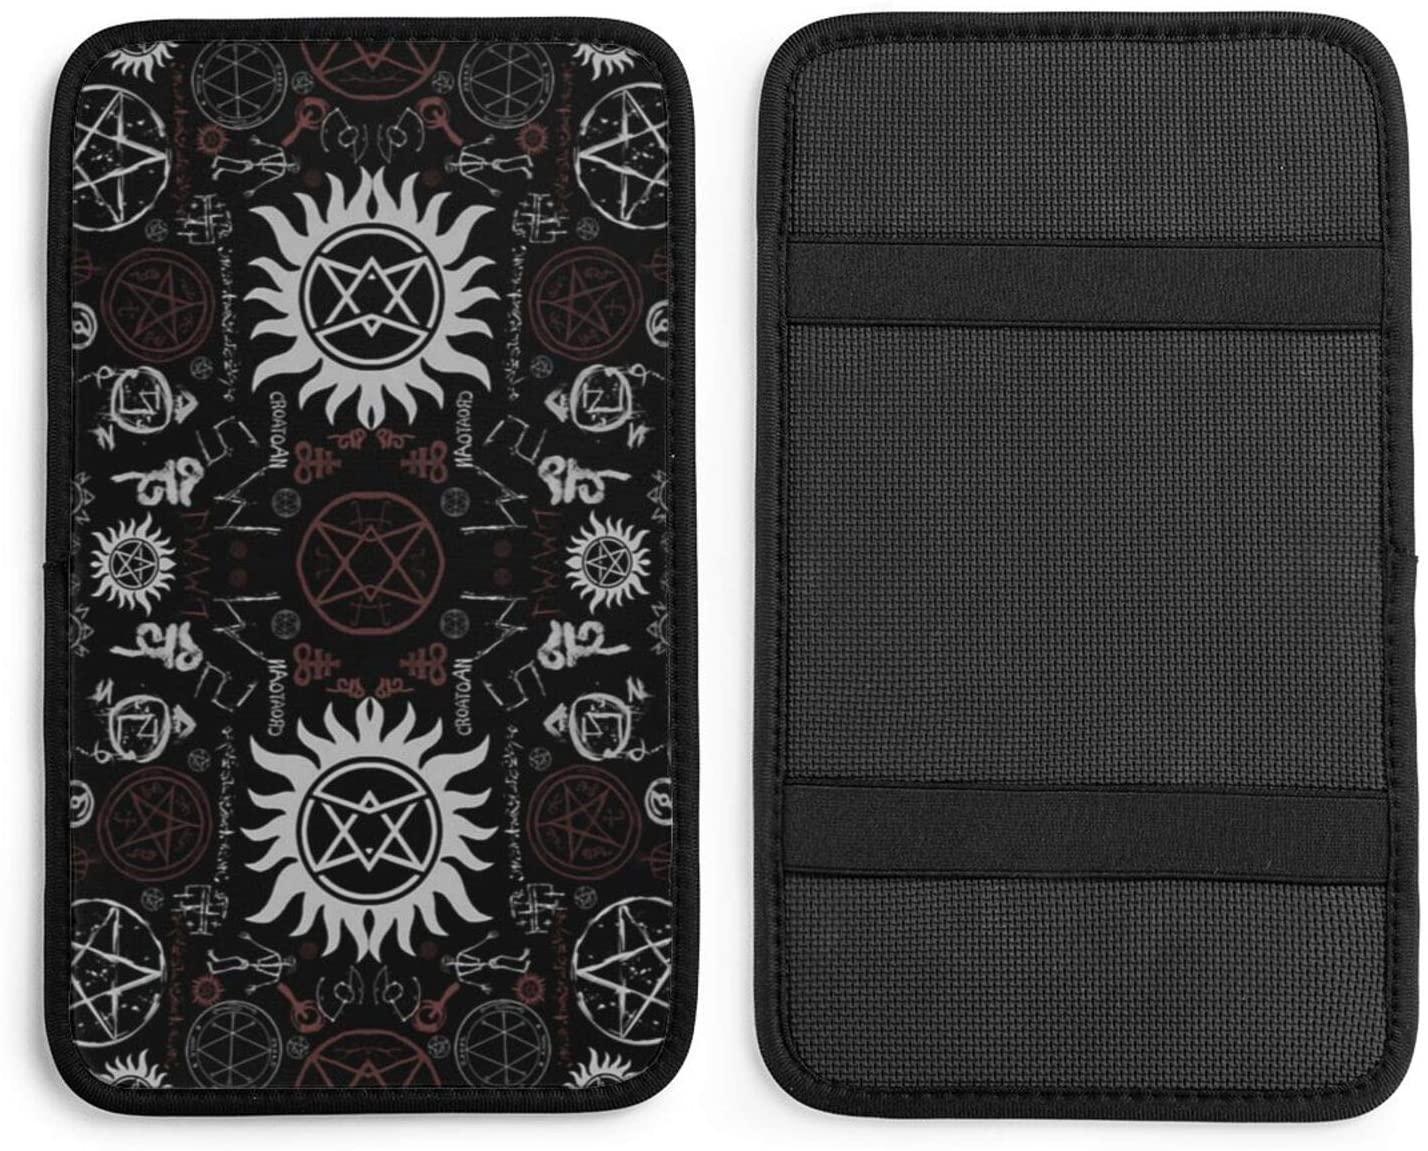 NDZHZEO Supernatural Symbols Black Auto Center Console Pad Car Armrest Seat Box Cover Protector Universal Fit